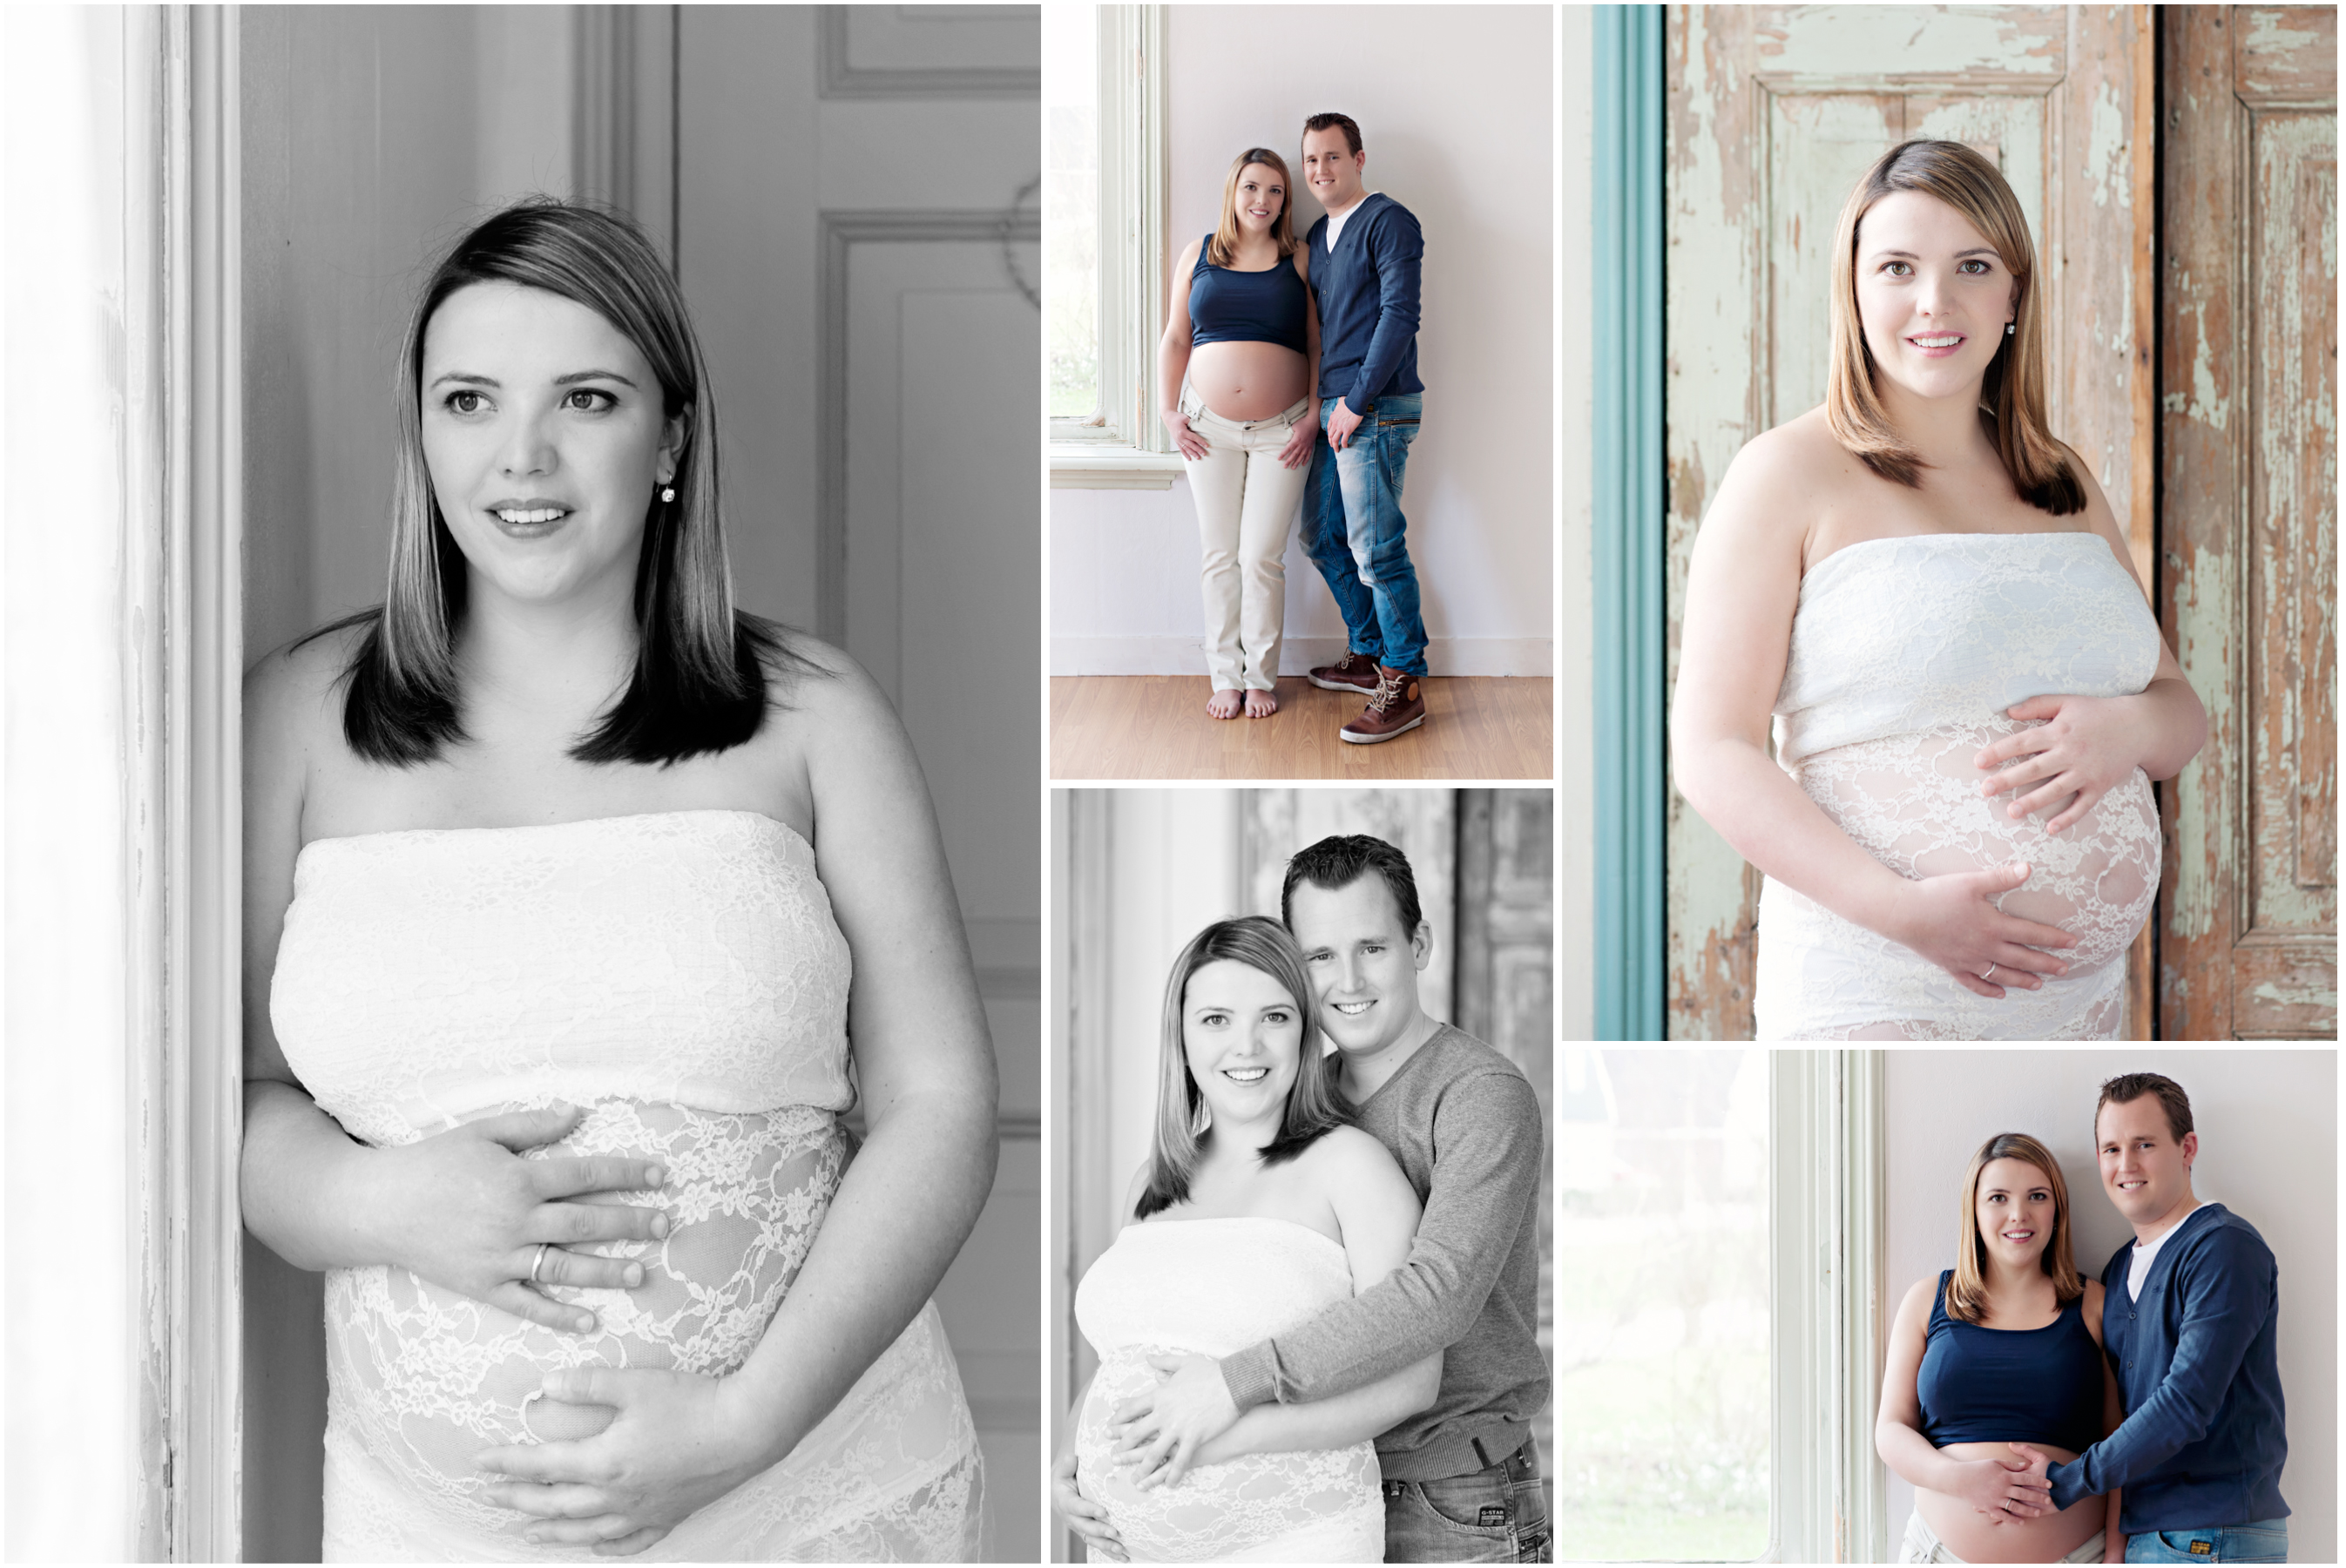 zwangerschapsreportage studio